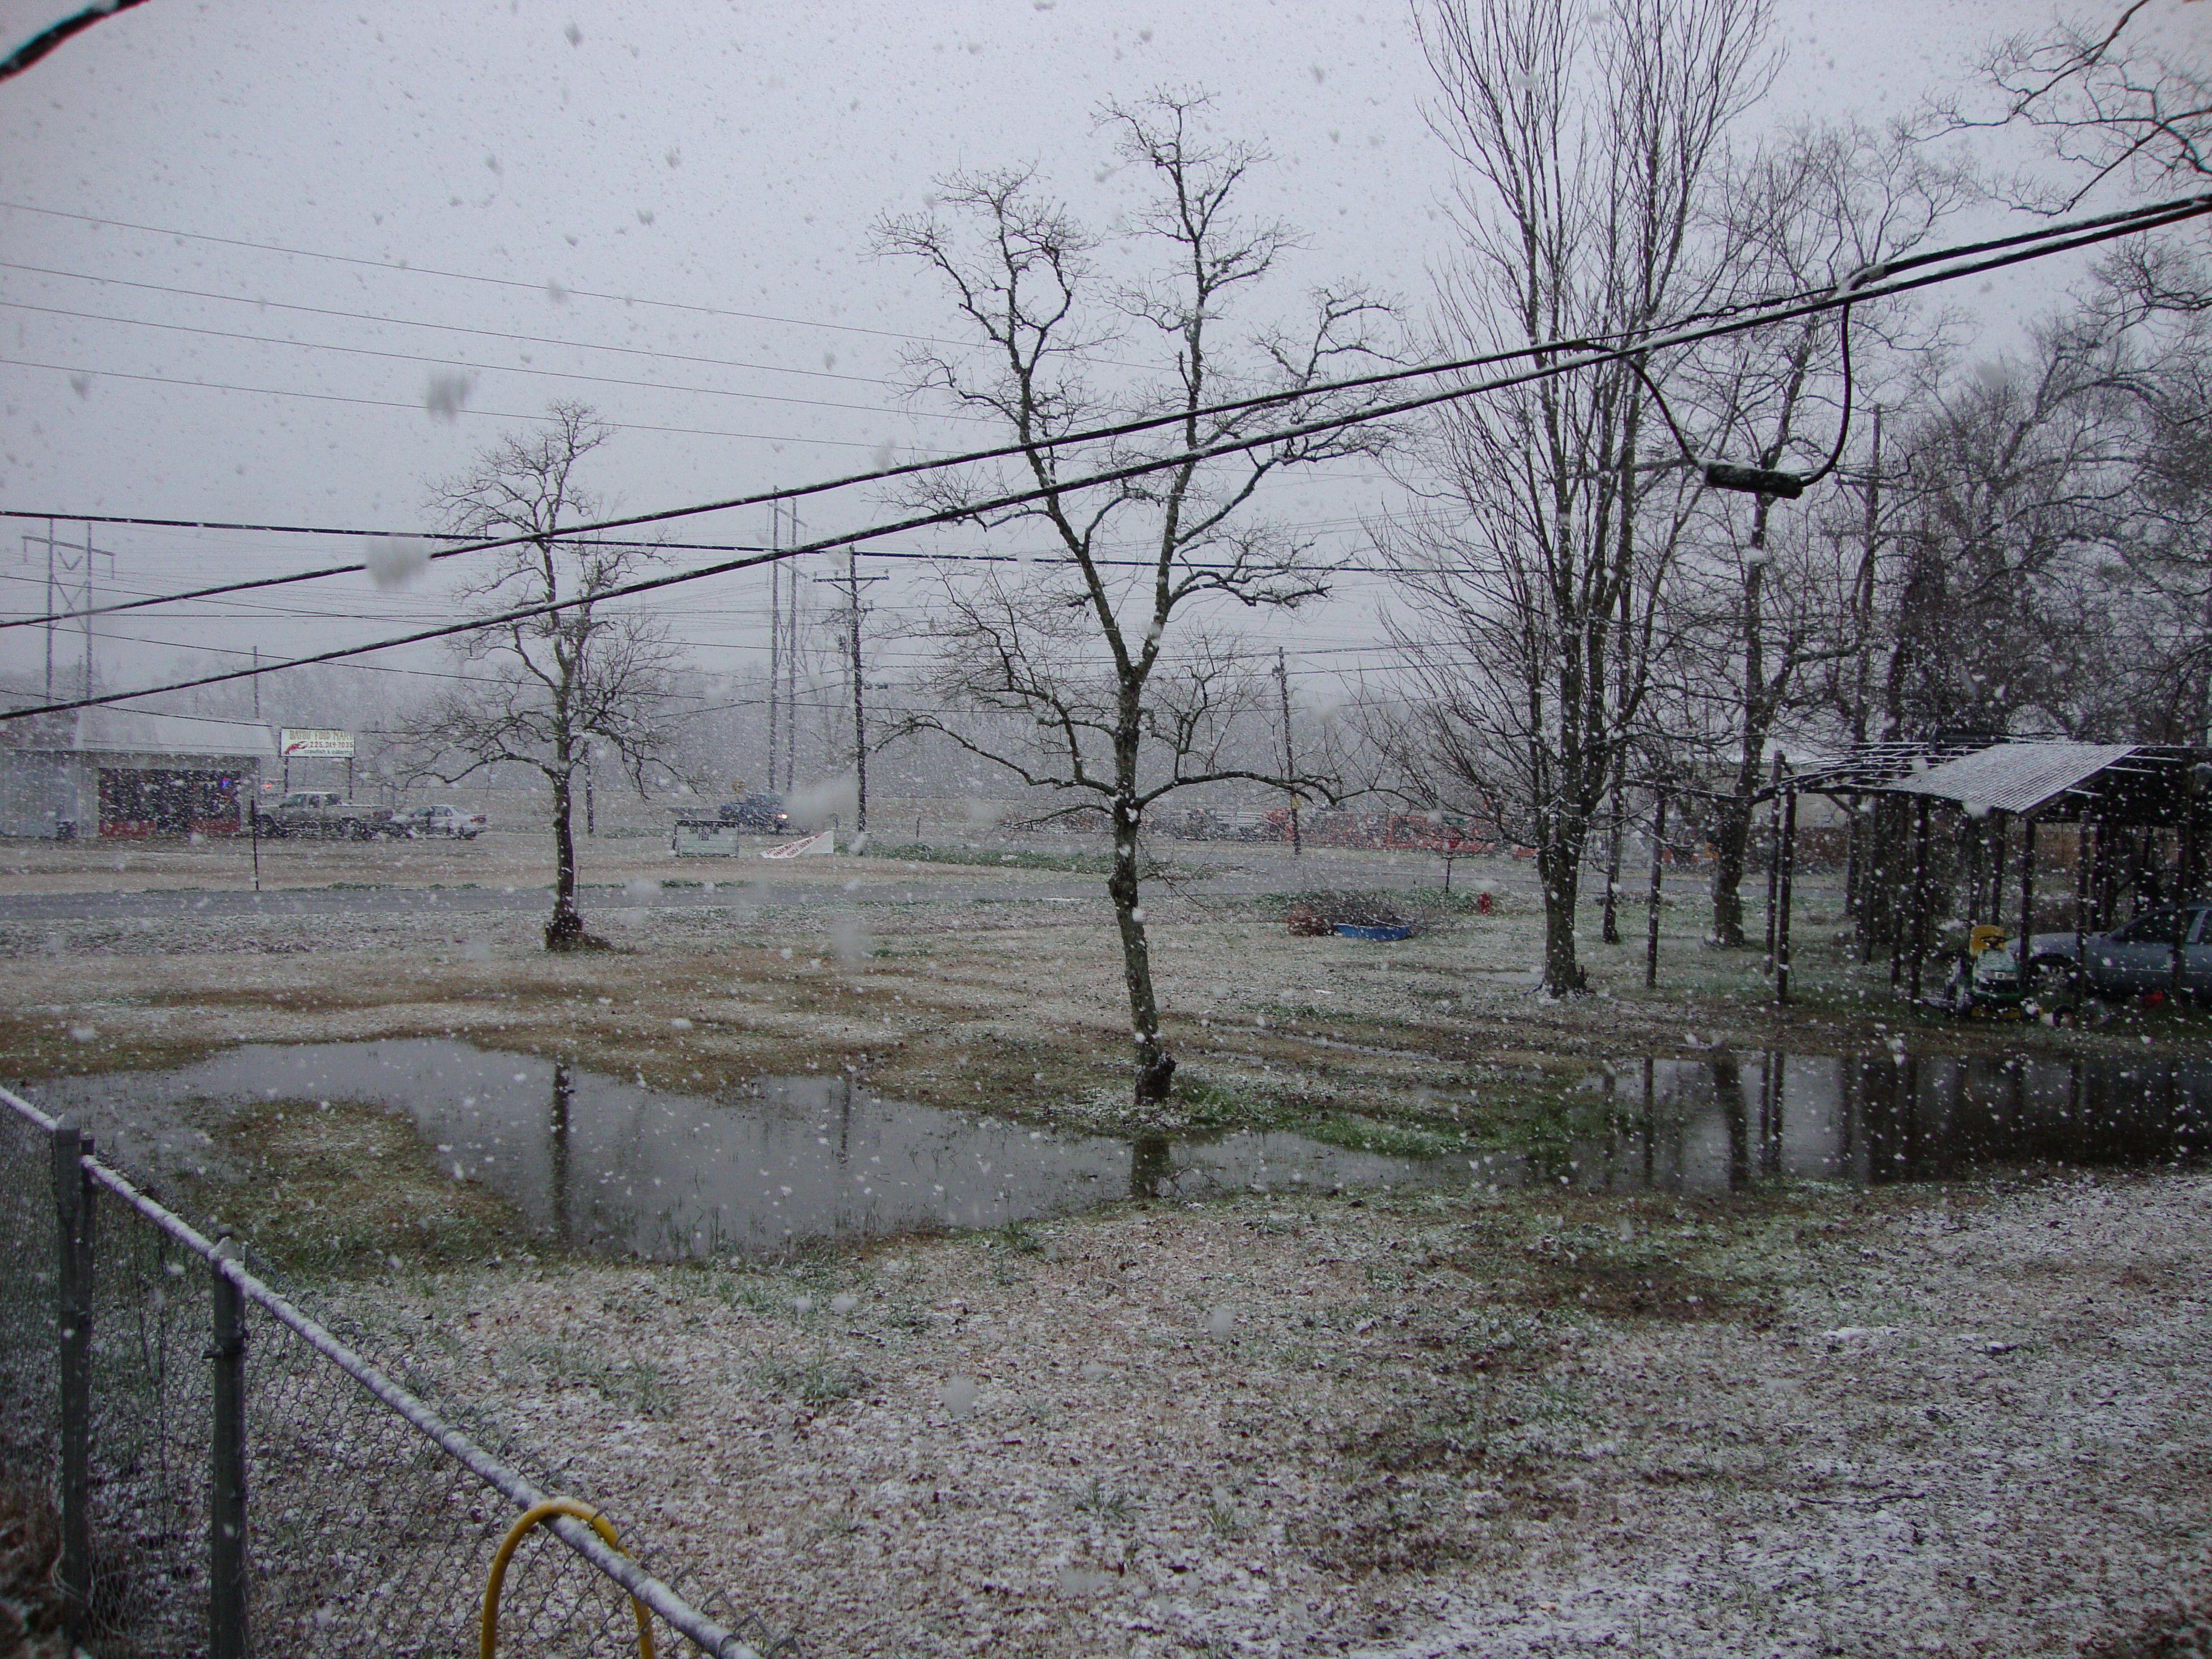 Snow, Slush, whatever